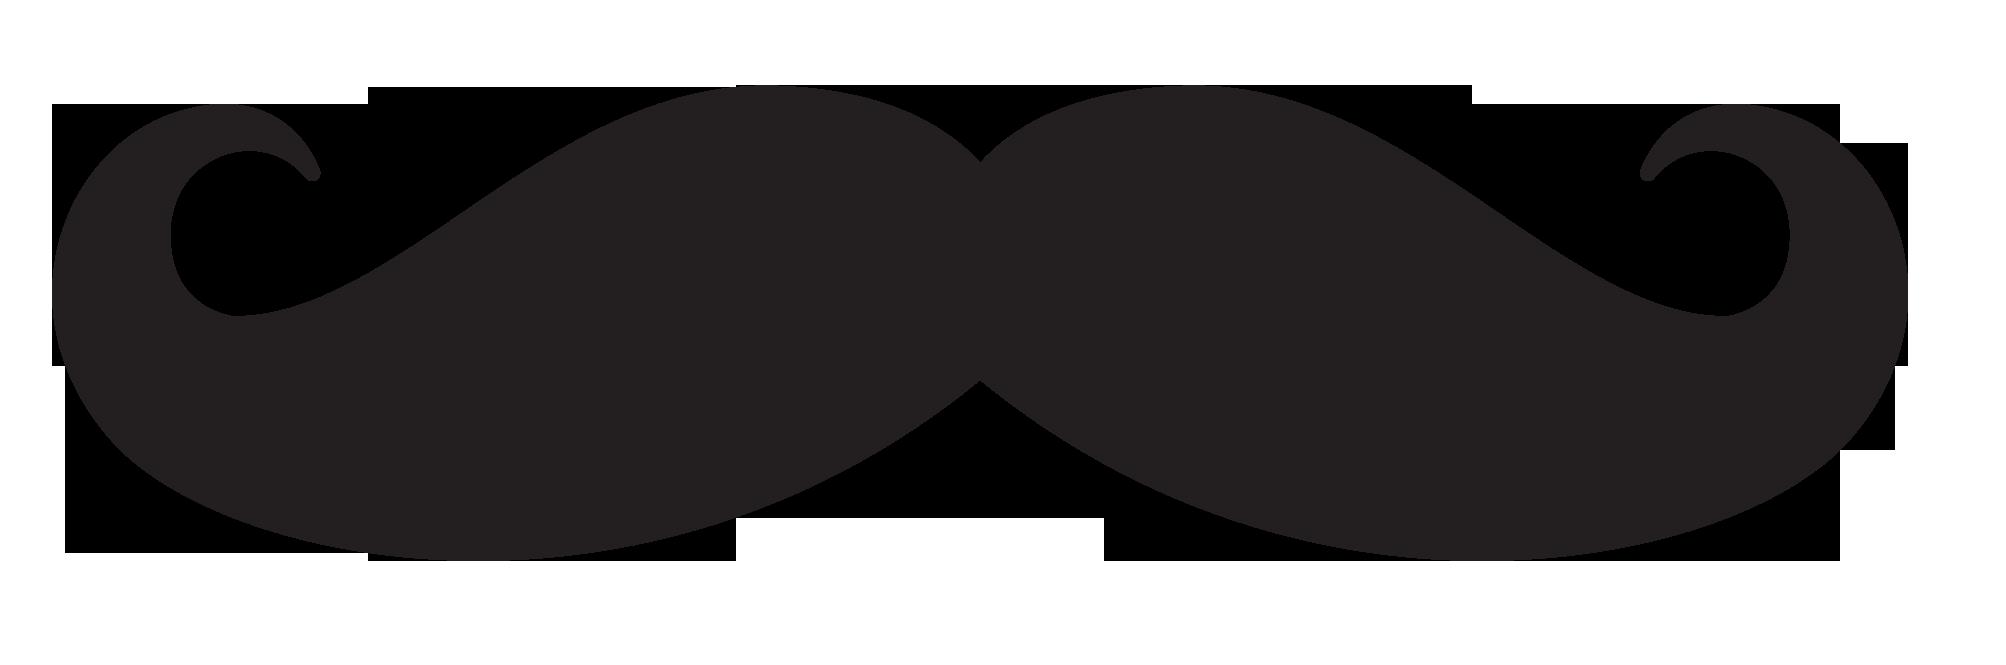 2006x665 Tie Clipart Mustache